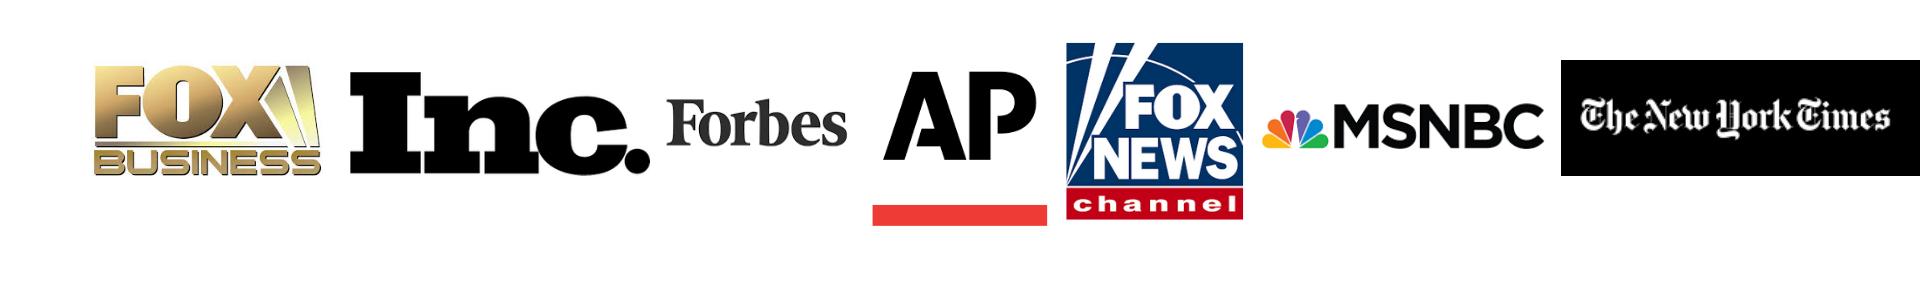 fox, forbes, AP, fox news, msnbc, new york times